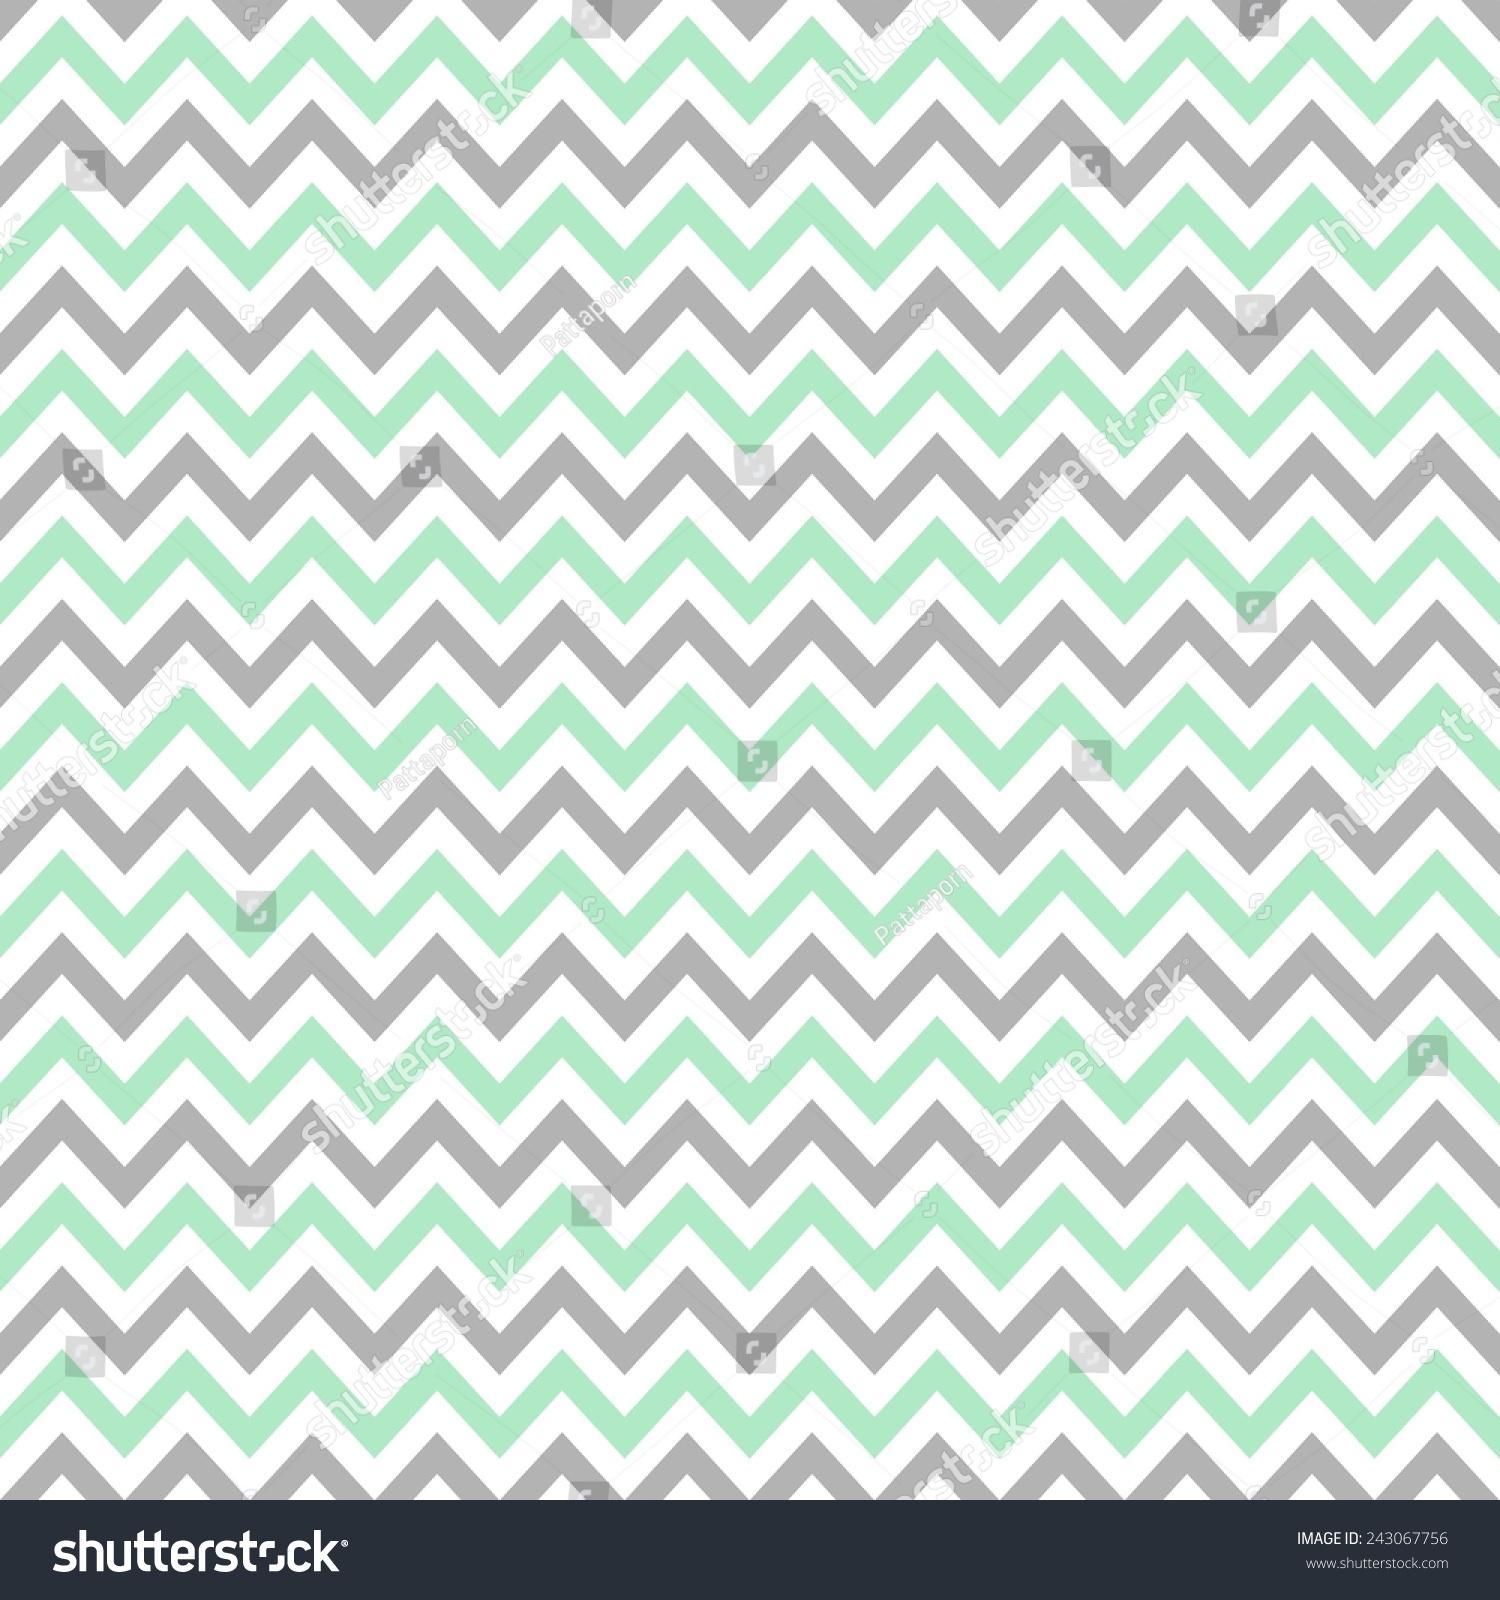 Digital Paper Scrapbook Light Mint Gray Stock Illustration 243067756